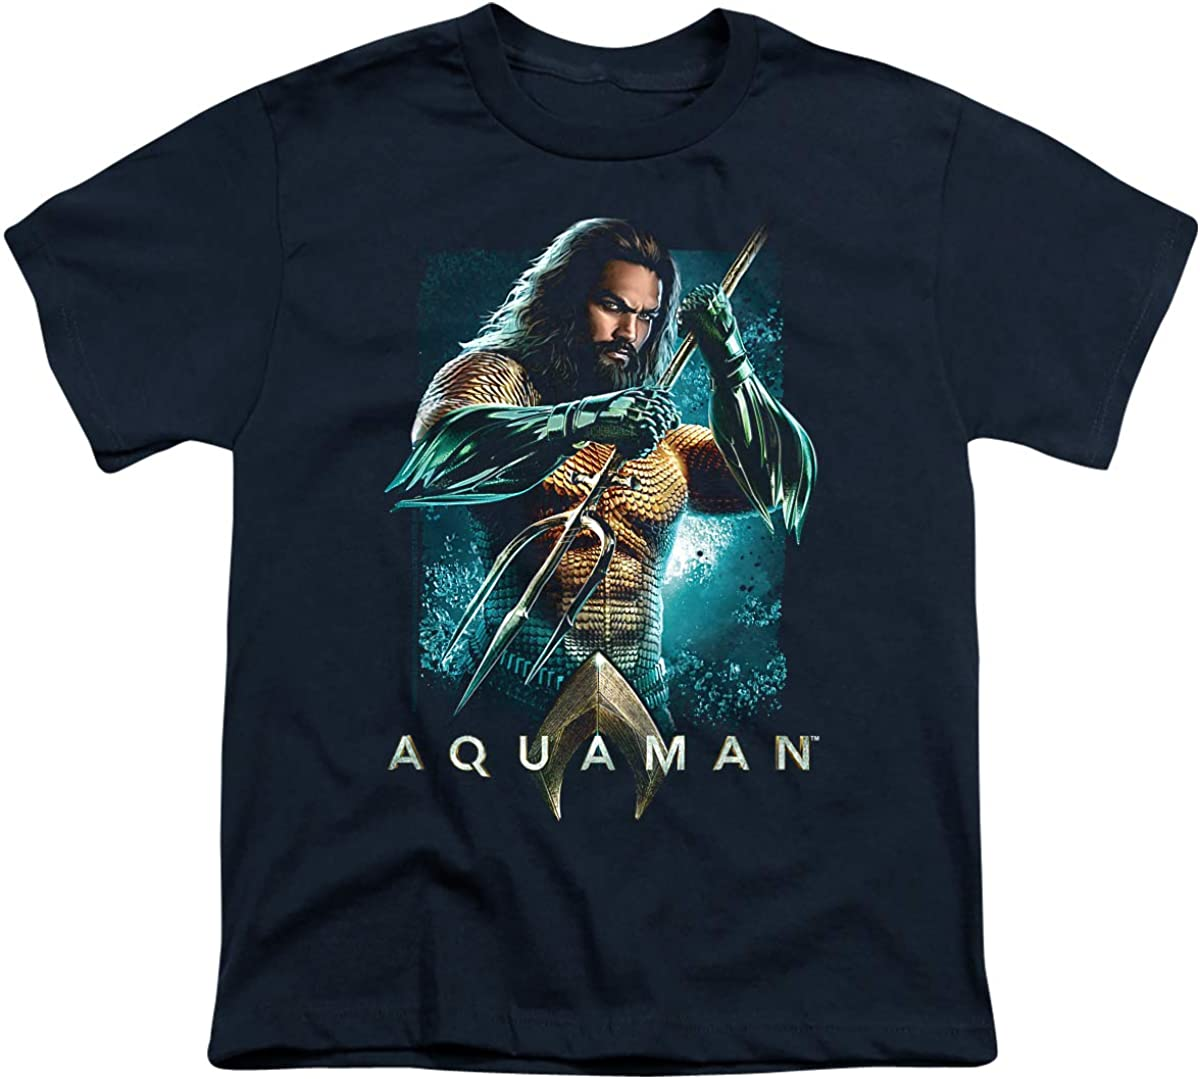 Aquaman Movie Trident Unisex Youth T Shirt